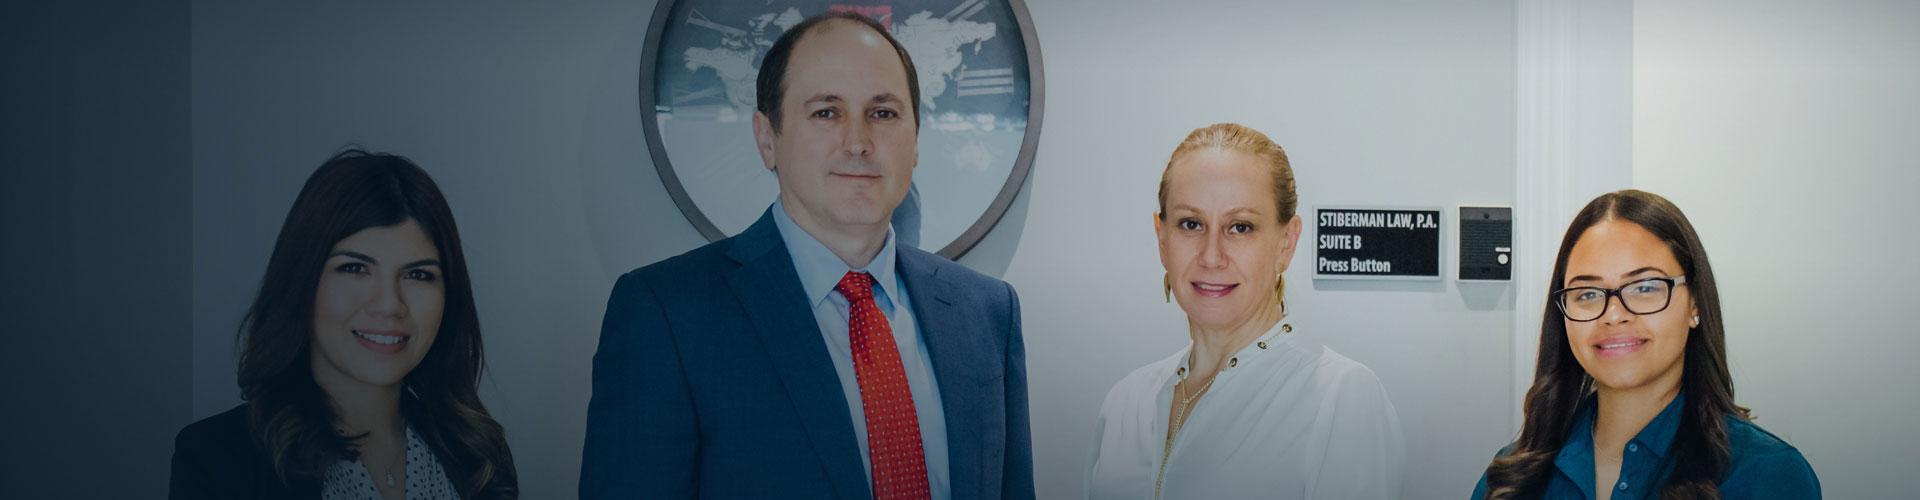 Miami-Dade Foreclosure Defense Attorneys - Stiberman Law Firm